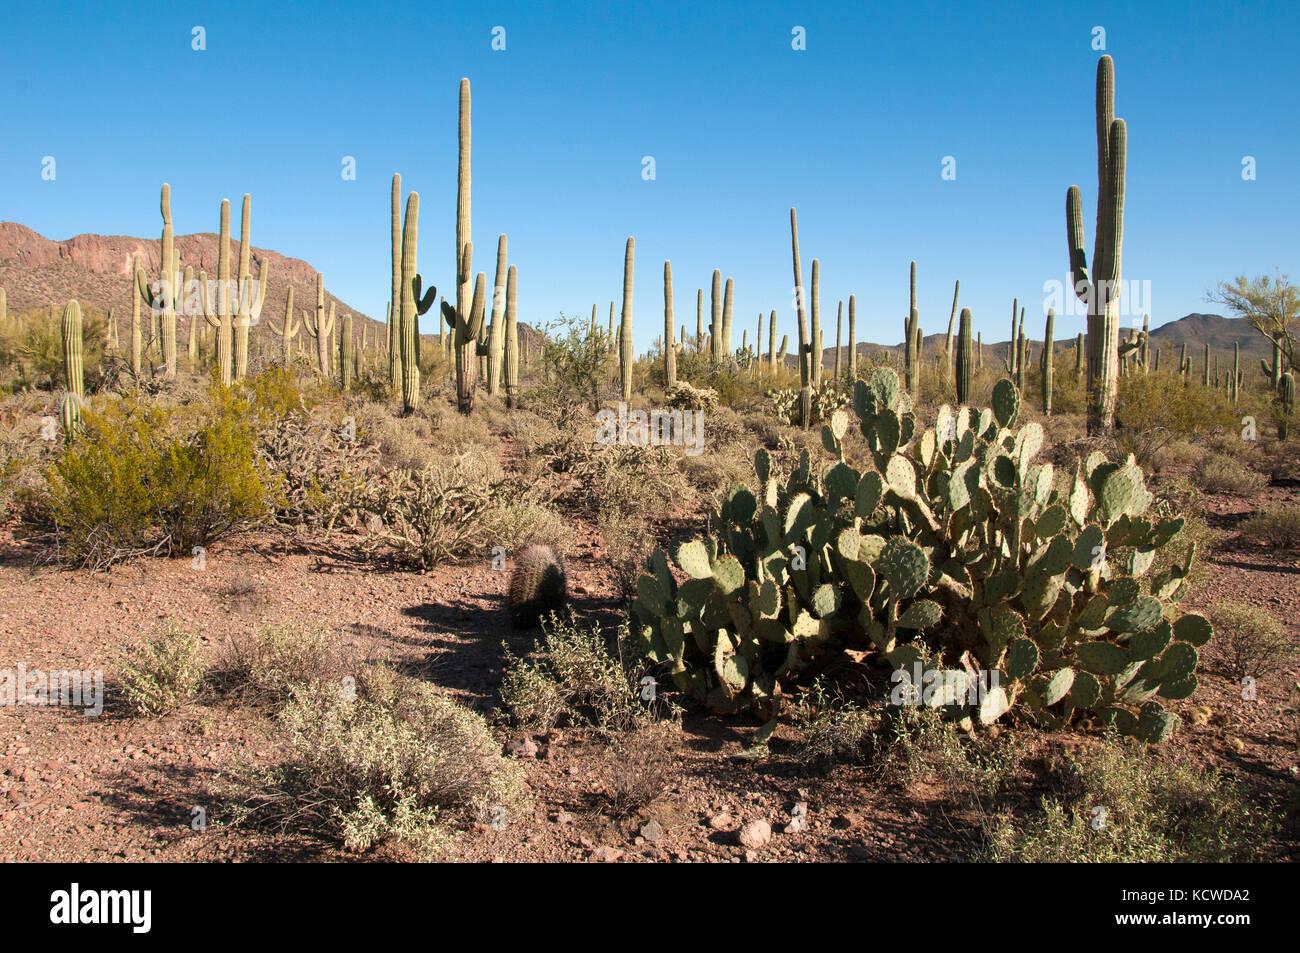 Prickly Pear and Saguaro cactus, Saguaro National Park, AZ, USA - Stock Image